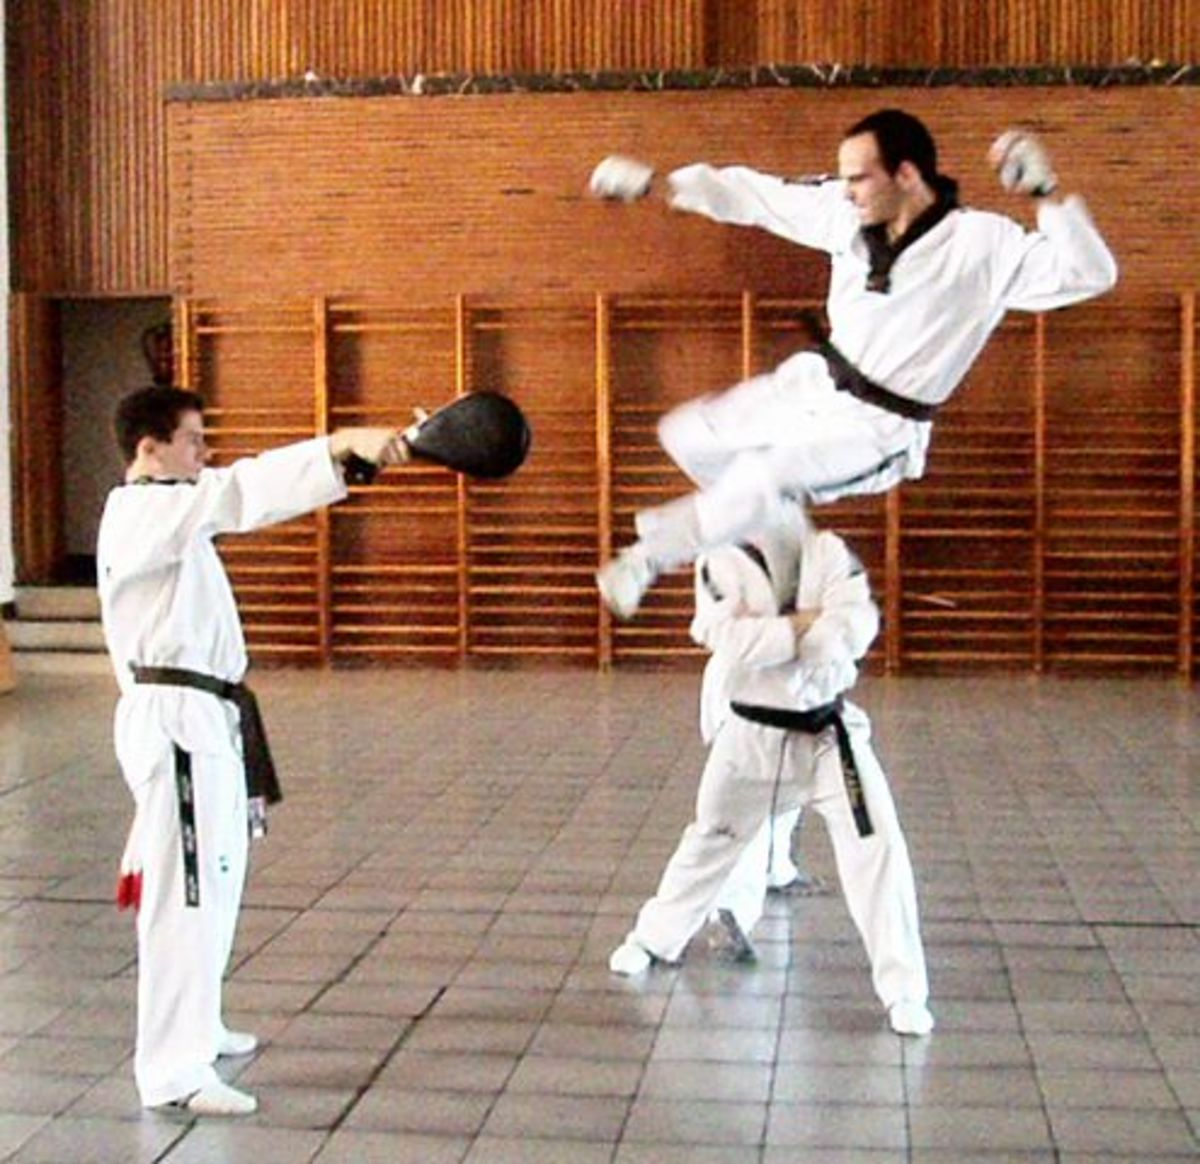 Tae Kwon Do & MMA: Effectively Applying TKD Into MMA Training